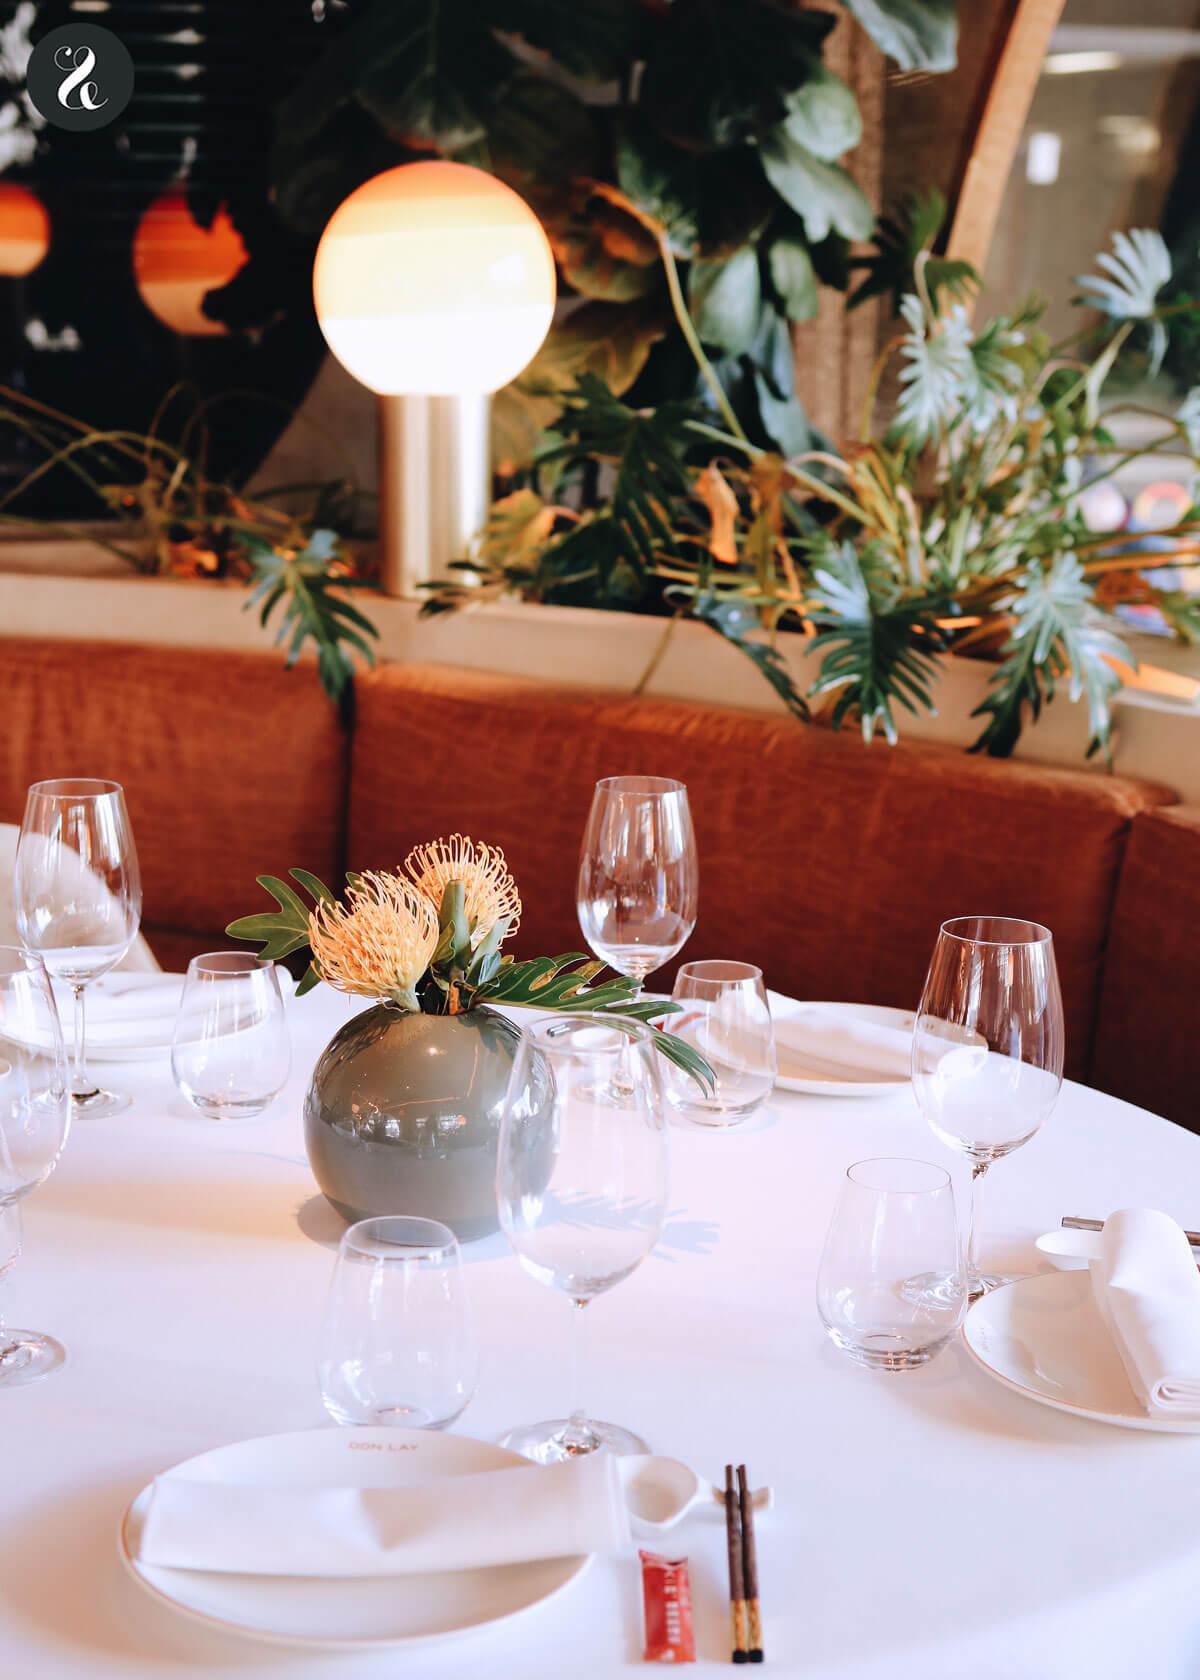 mejores restaurantes románticos Madrid - Don Lay